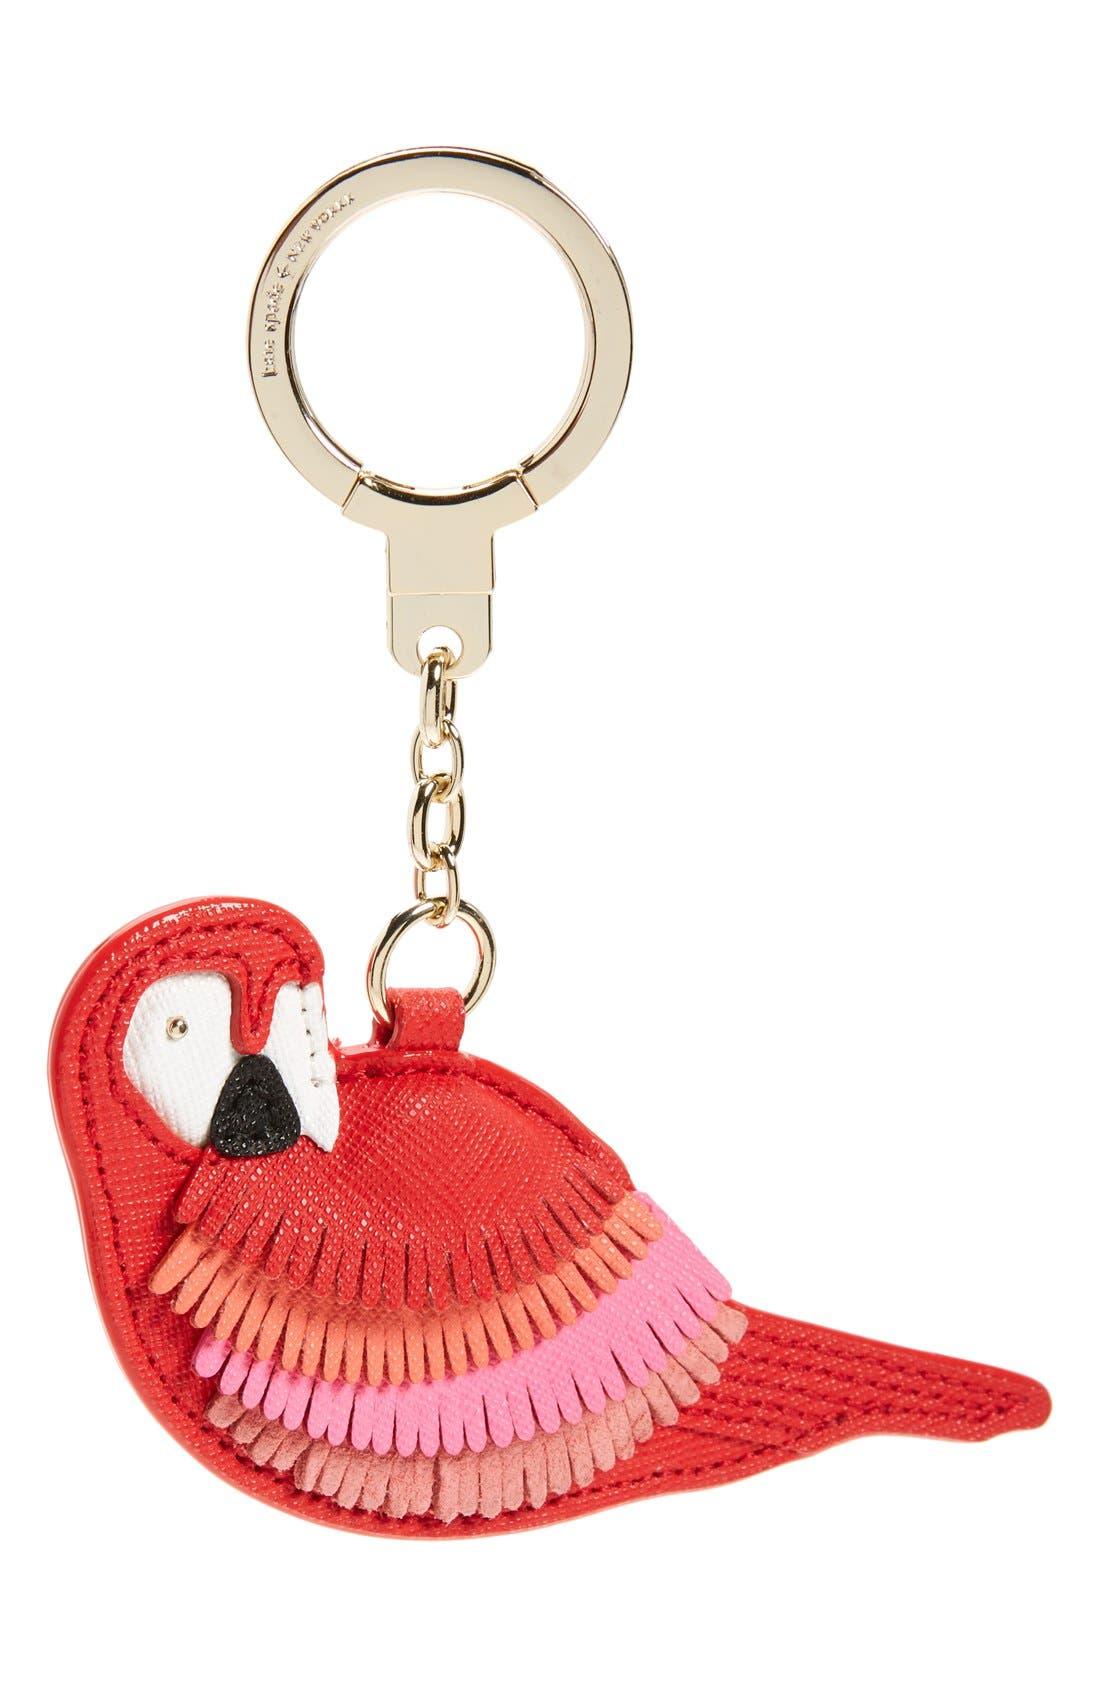 Alternate Image 1 Selected - kate spade new york 'parrot' bag charm